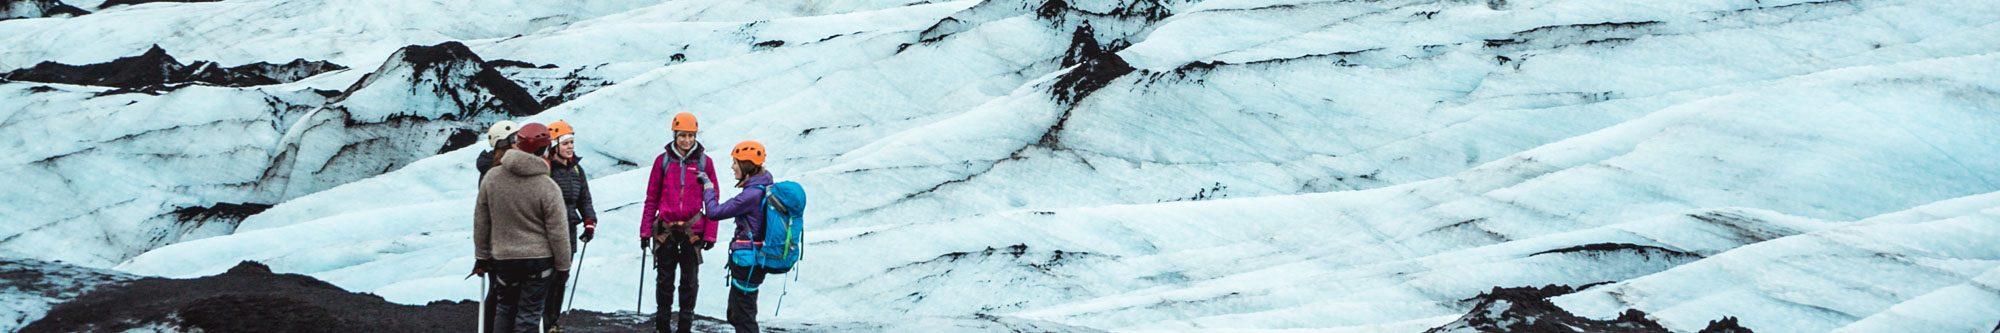 Randonnée sur glacier Solheimajokull